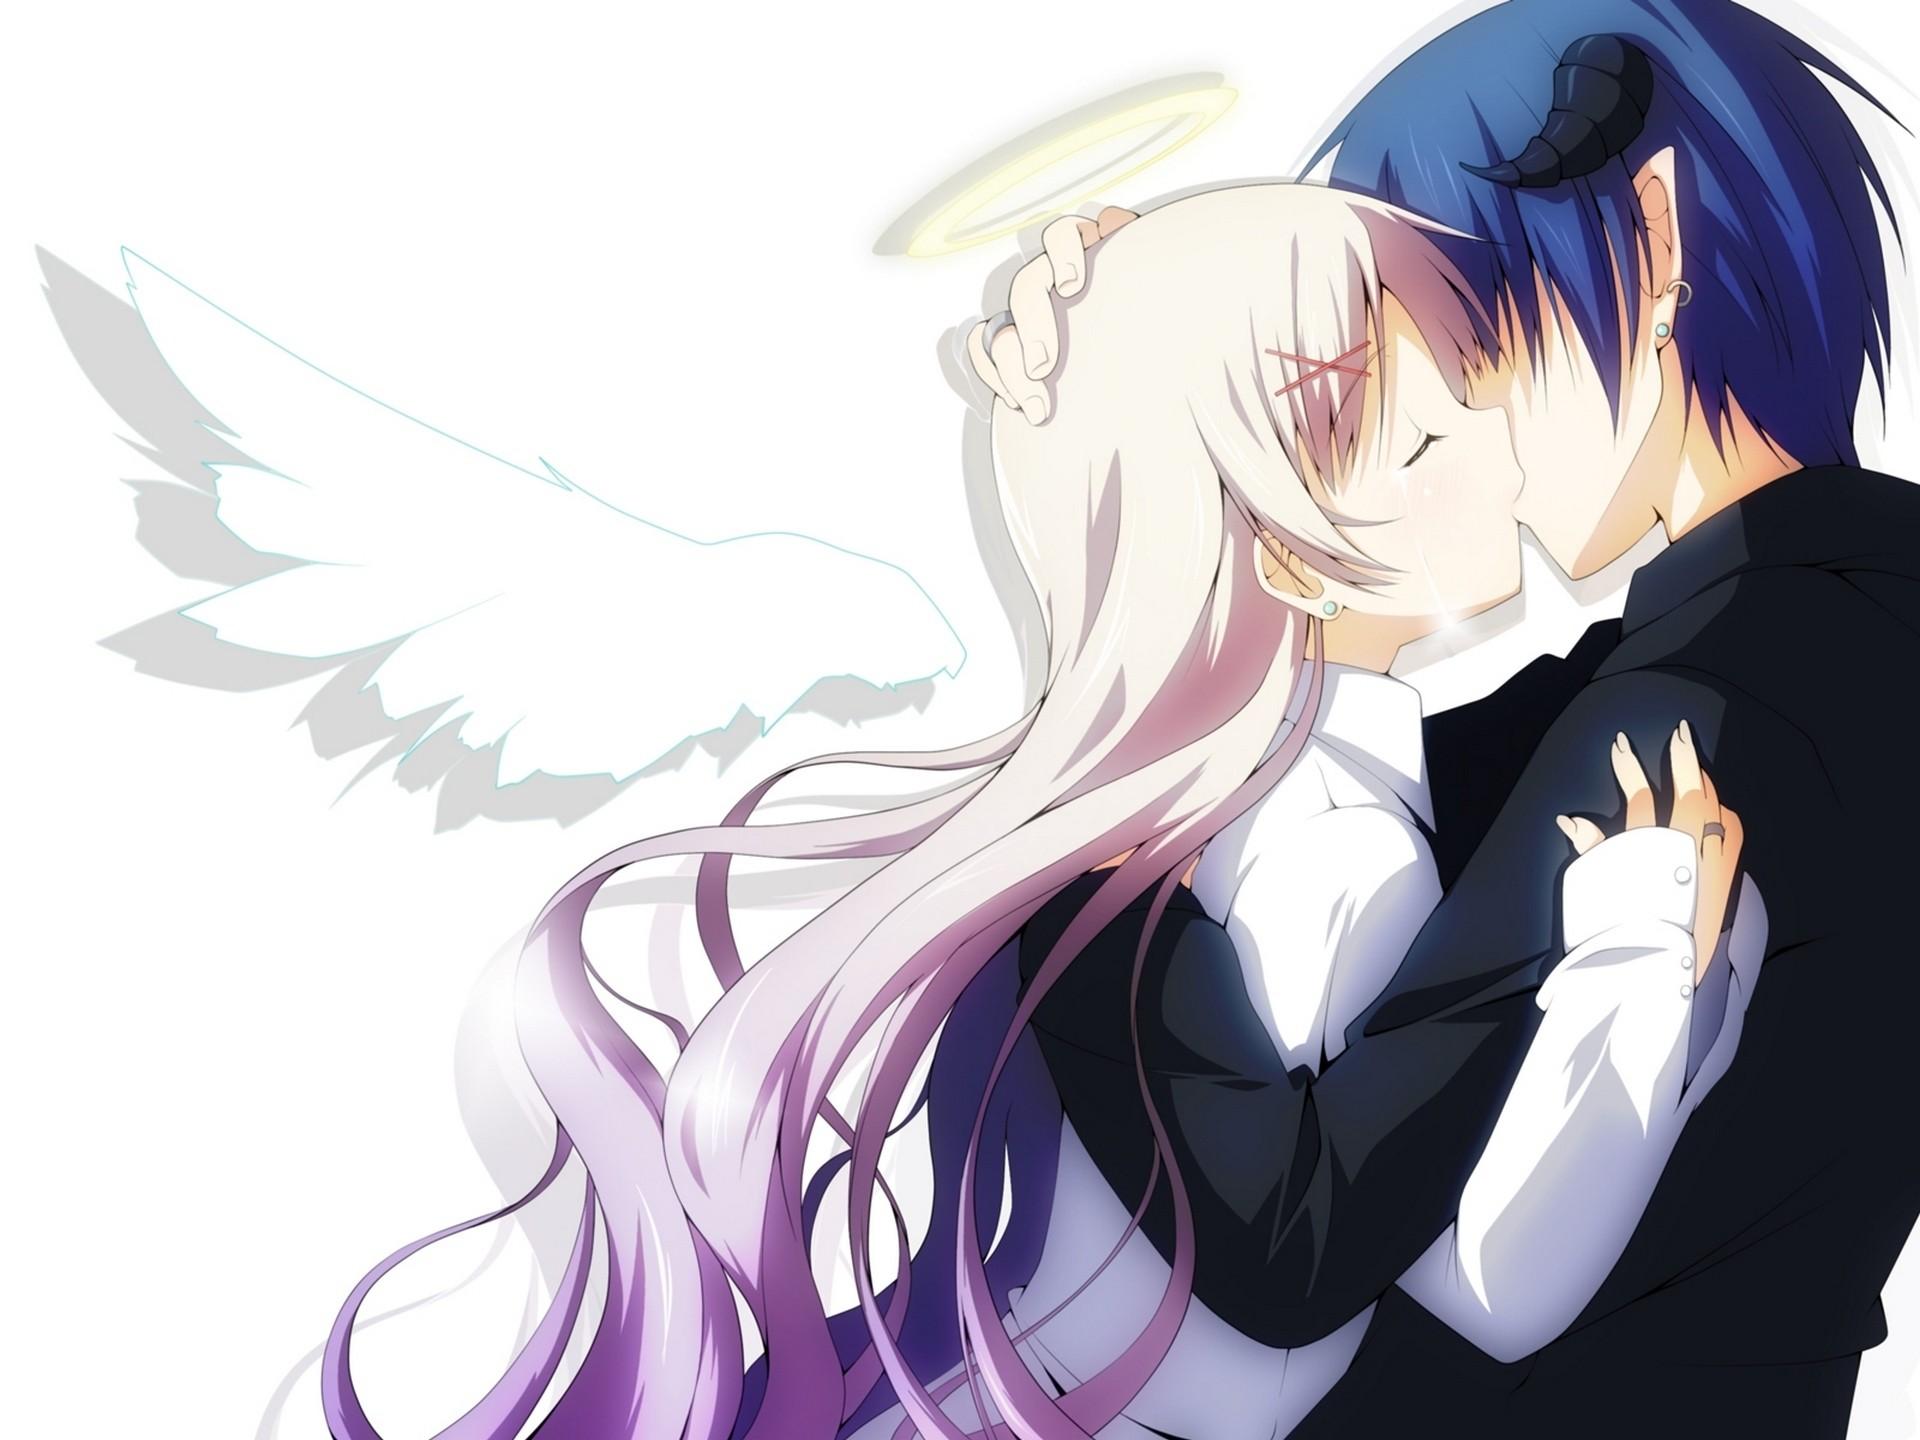 Res: 1920x1440, Anime Couple, Kissing, Romance